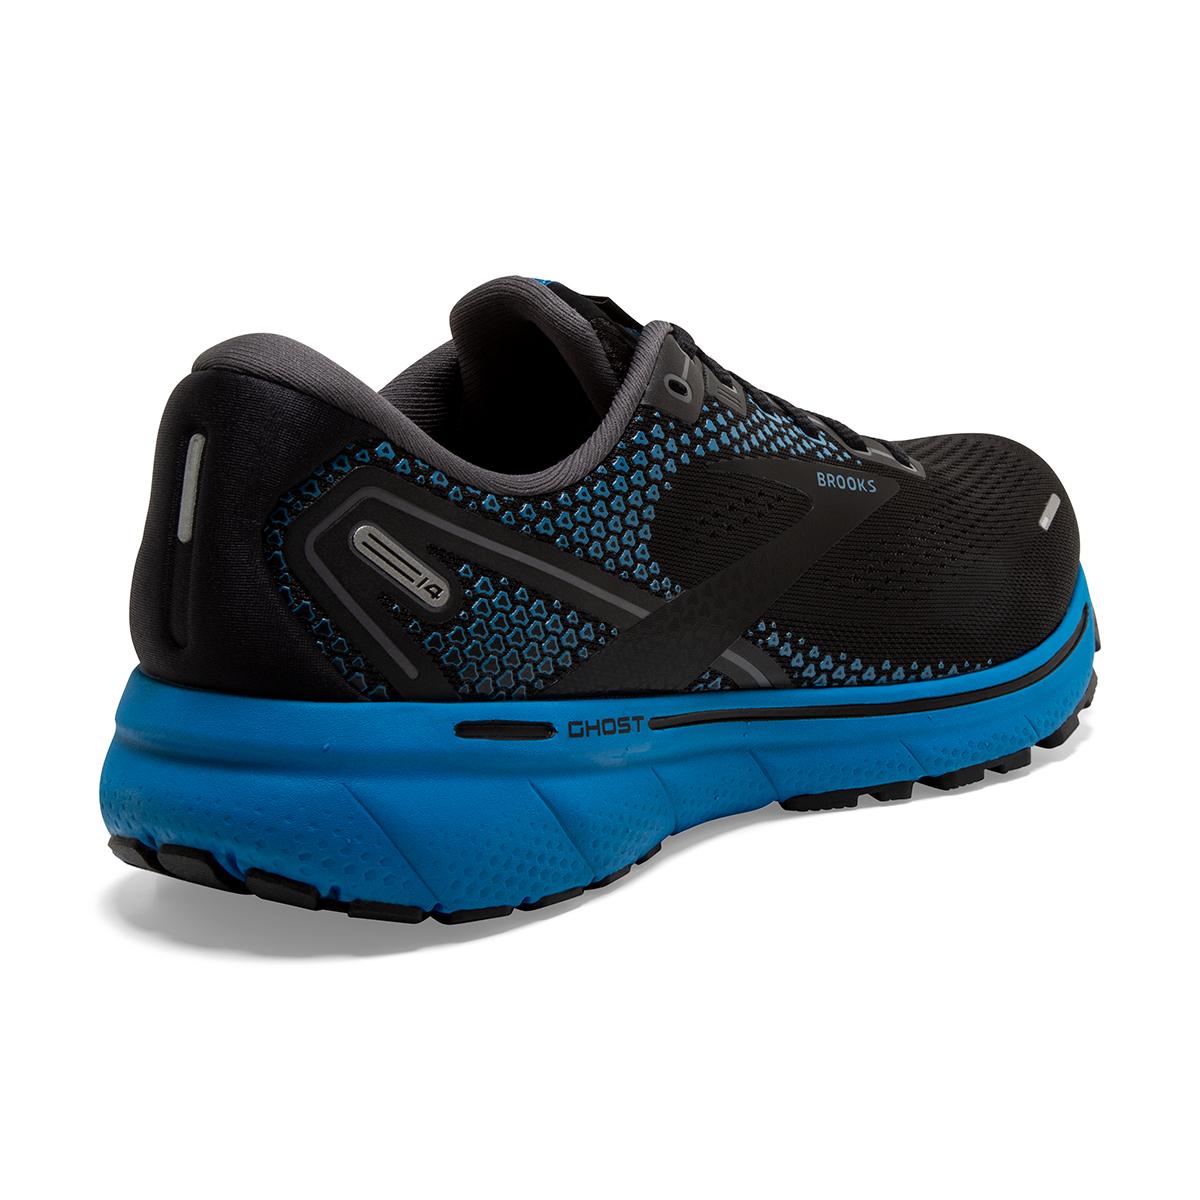 Men's Brooks Ghost 14 Running Shoe - Color: Black/Blackened - Size: 7 - Width: Regular, Black/Blackened, large, image 6